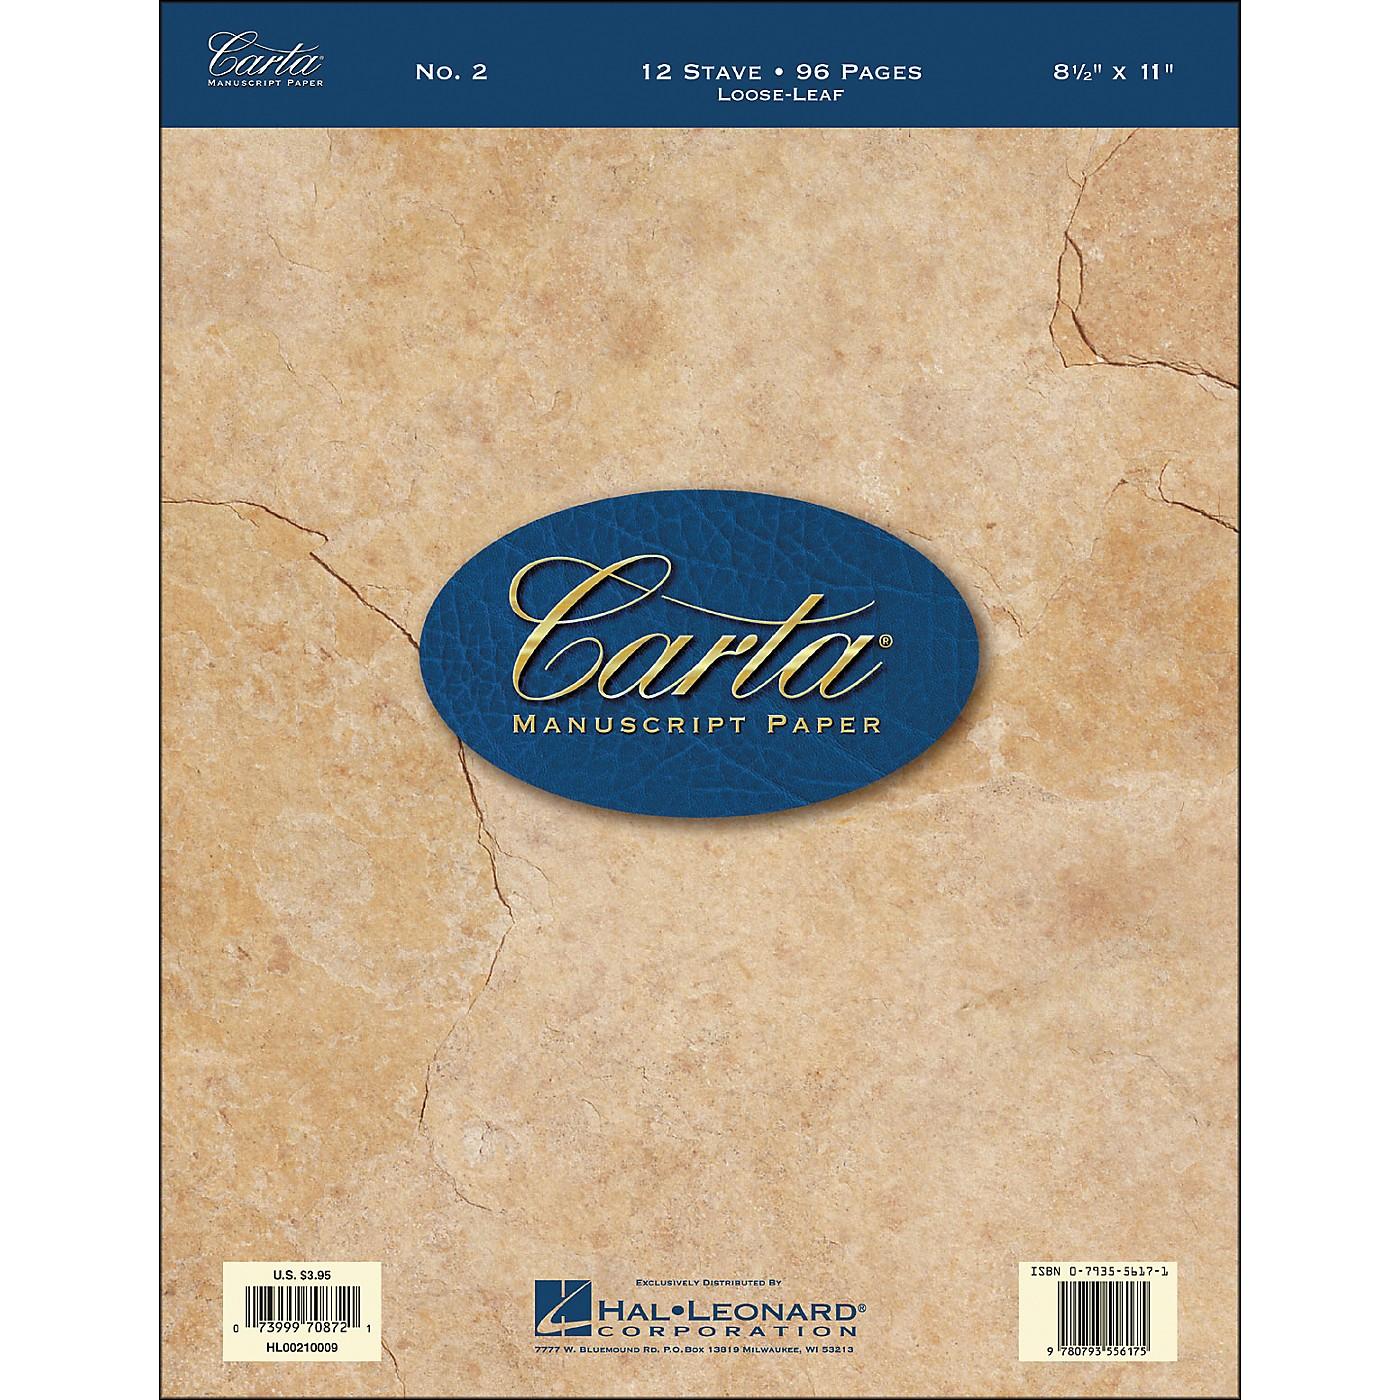 Hal Leonard Carta Manuscript Paper # 2 - Looseleaf, 8.5 X 11, 96 Pages, 12 Stave thumbnail